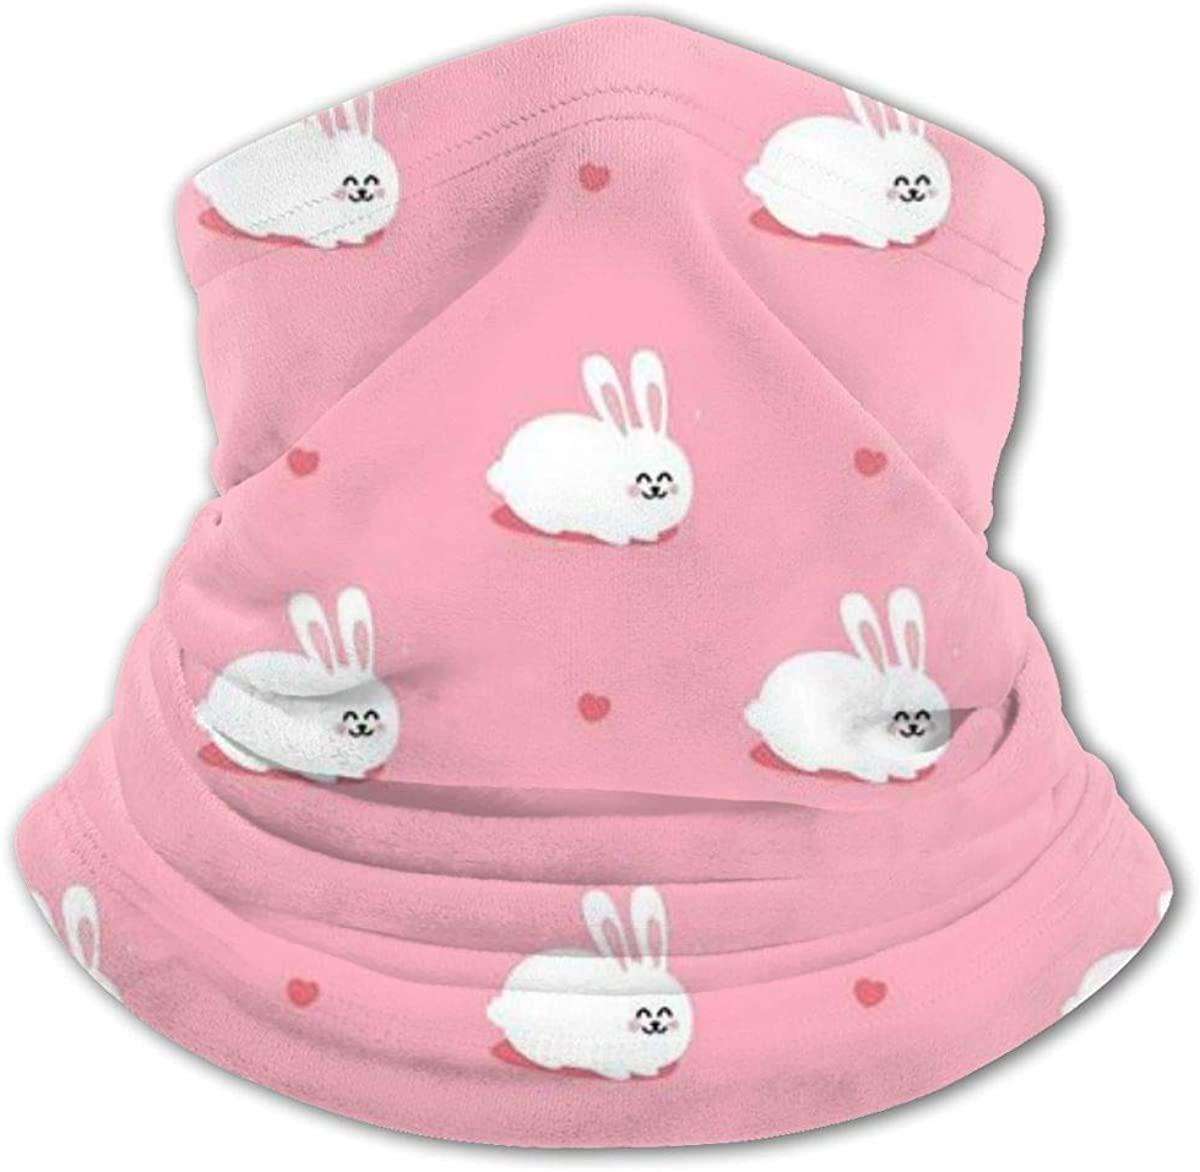 Pink Rabbit Headwear For Girls And Boys, Head Wrap, Neck Gaiter, Headband, Tenn Fishing Mask, Magic Scarf, Tube Mask, Face Bandana Mask For Camping Running Cycling